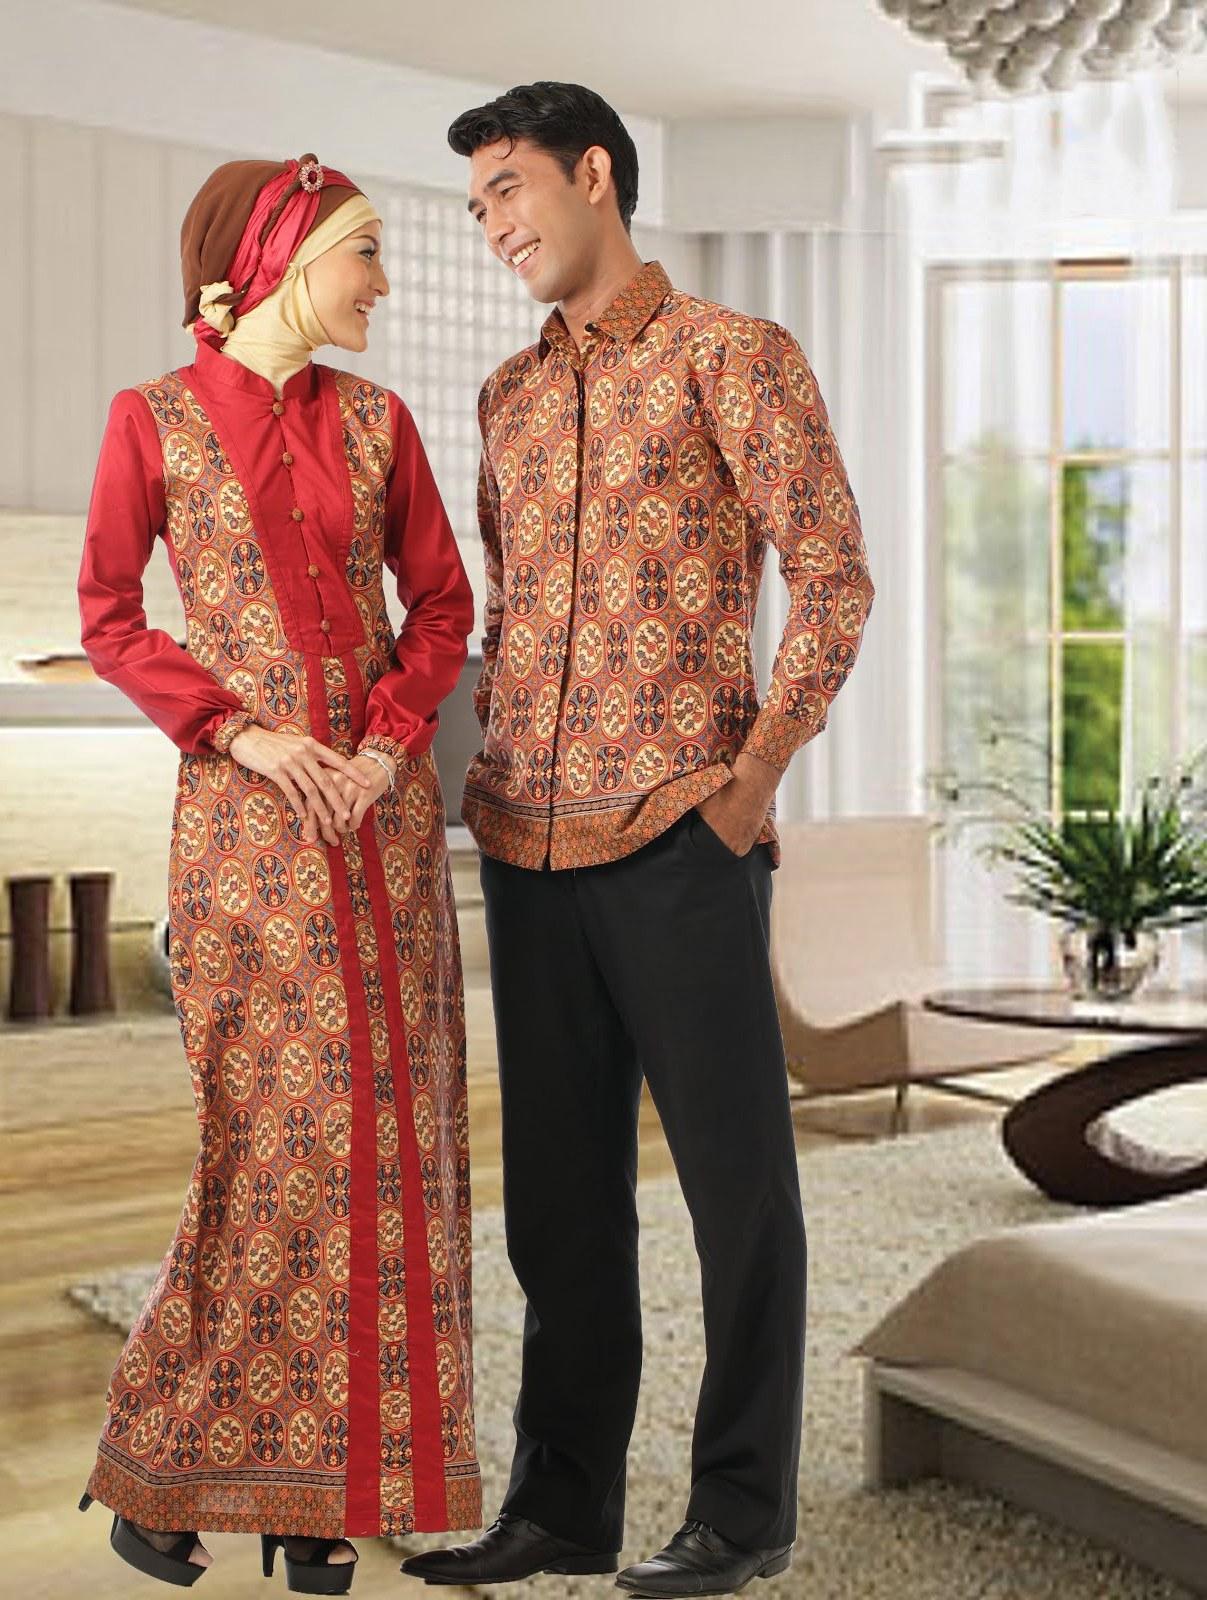 Bentuk Baju Lebaran Wanita Terbaru Kvdd Trend Model Baju Batik Lebaran Terbaru 2013